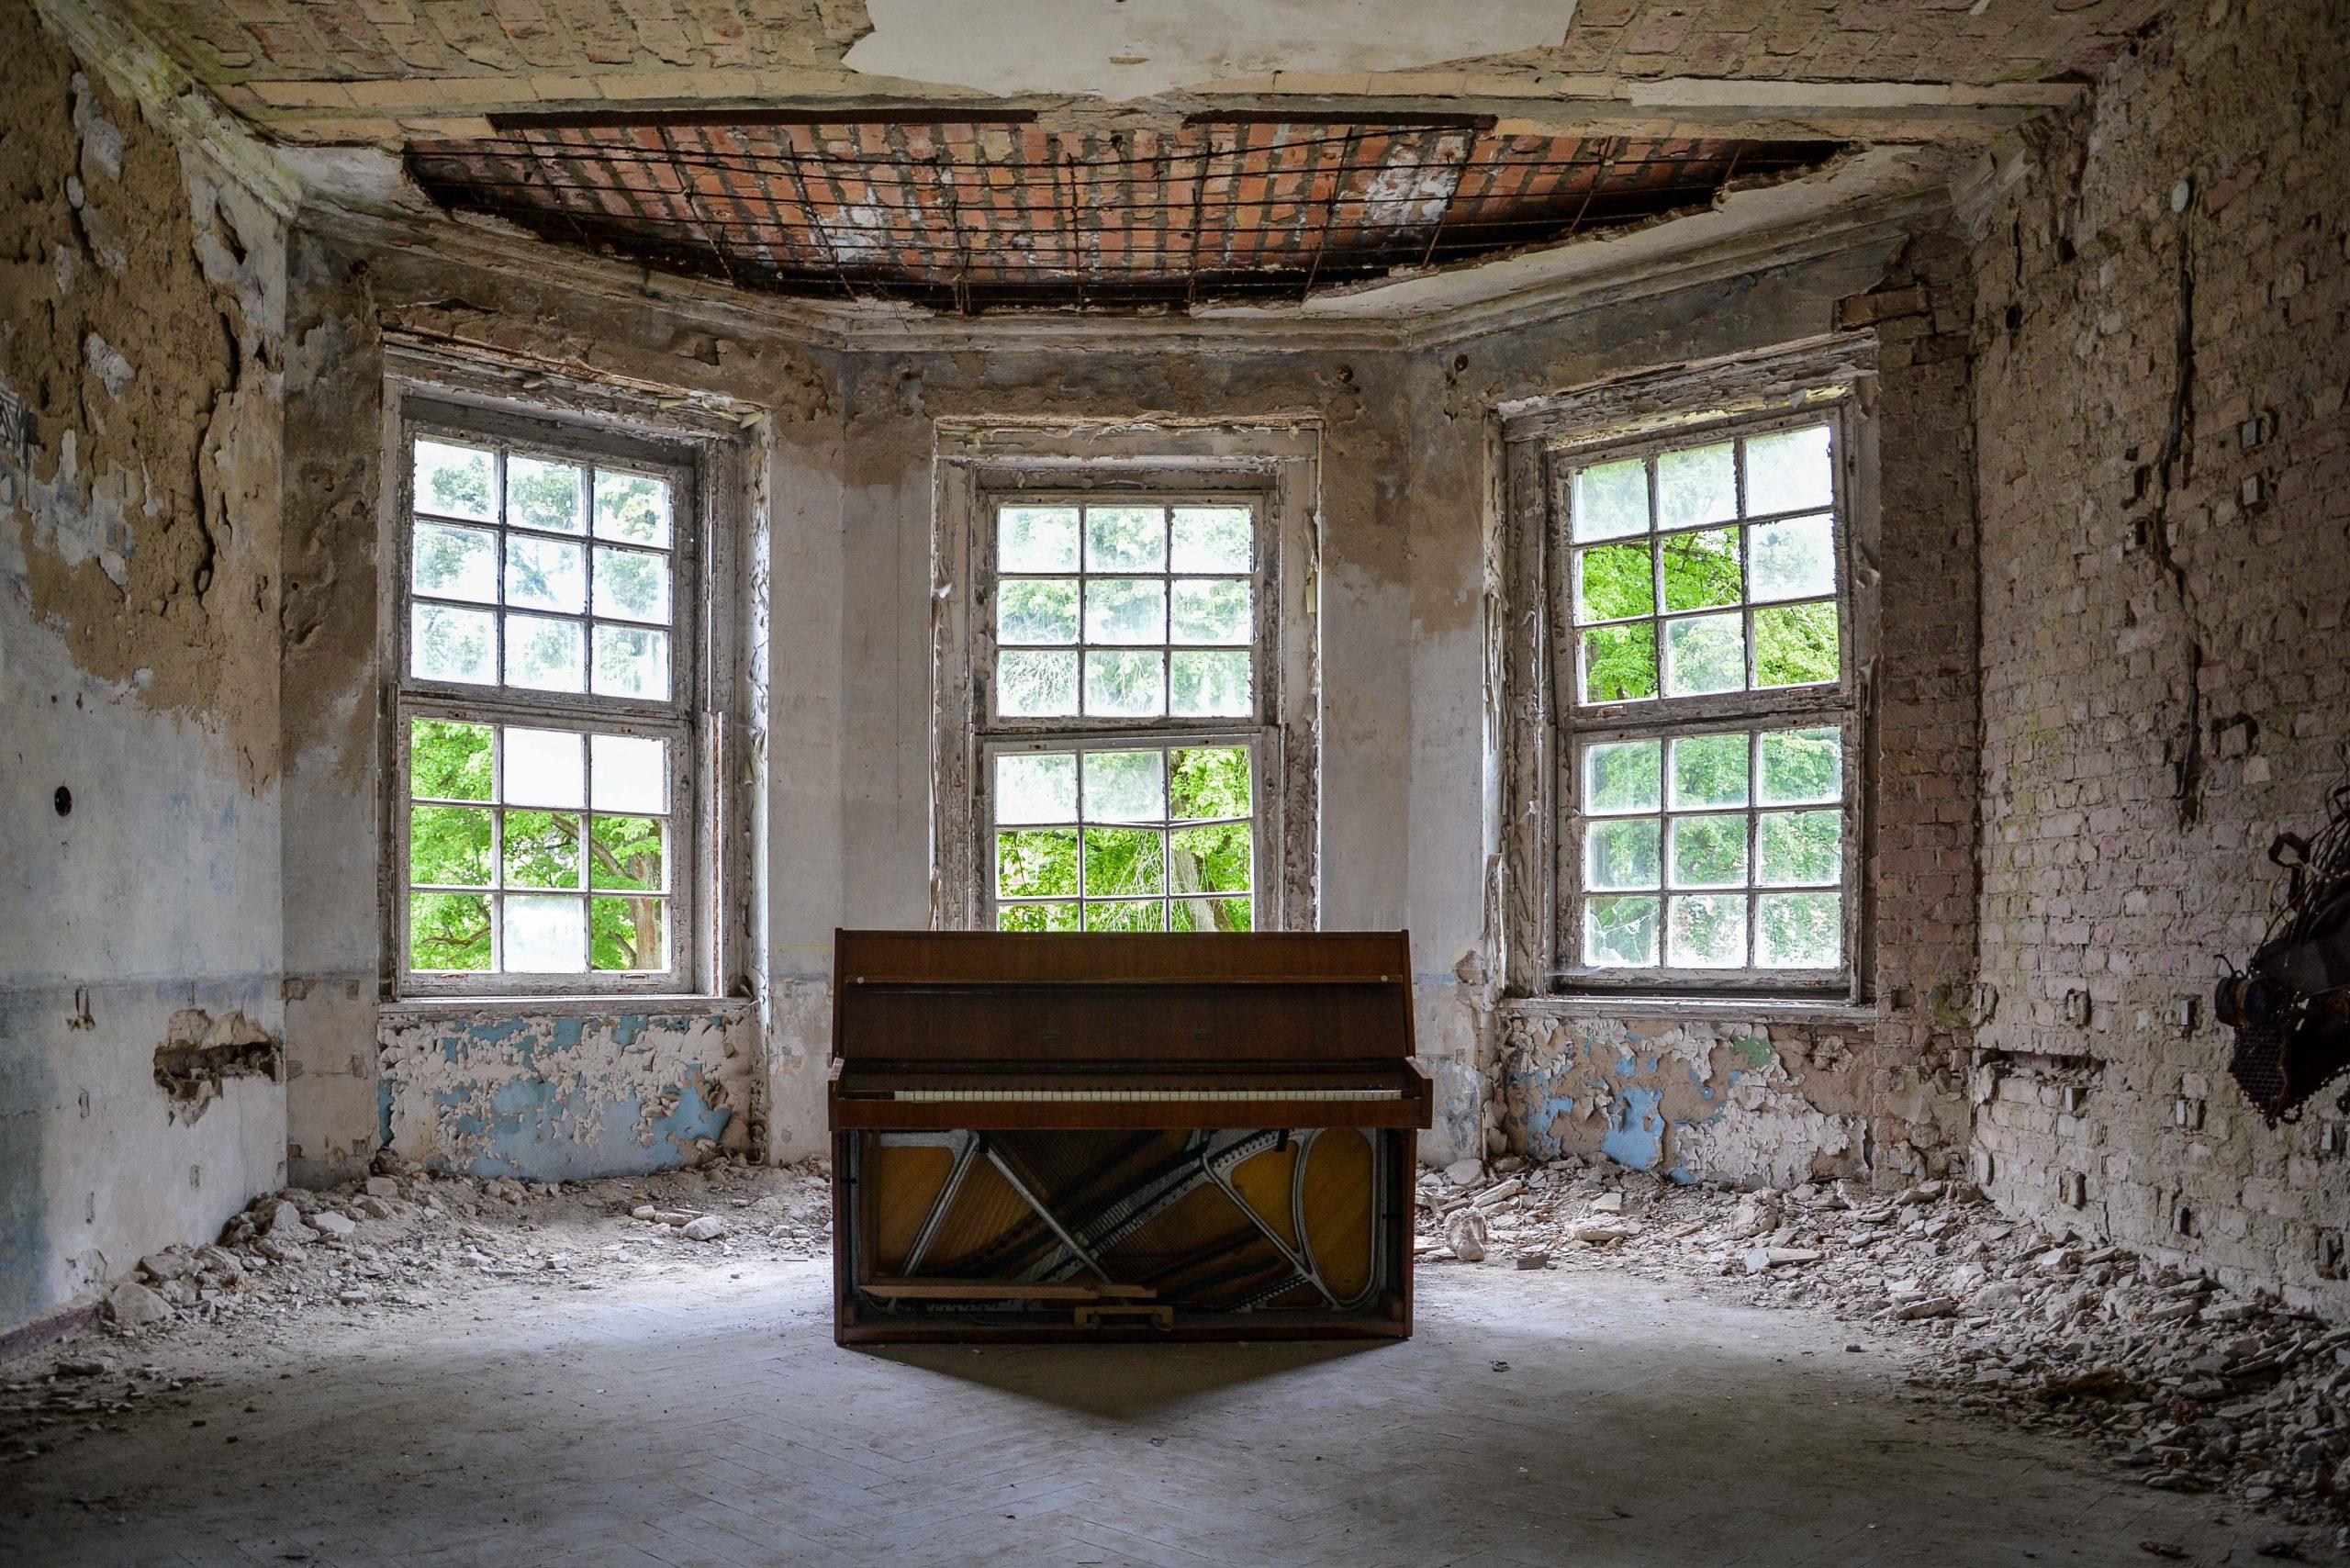 abandoned piano room tuberkulose heilstaette grabowsee sanatorium hospital oranienburg lost places abandoned urbex brandenburg germany deutschland